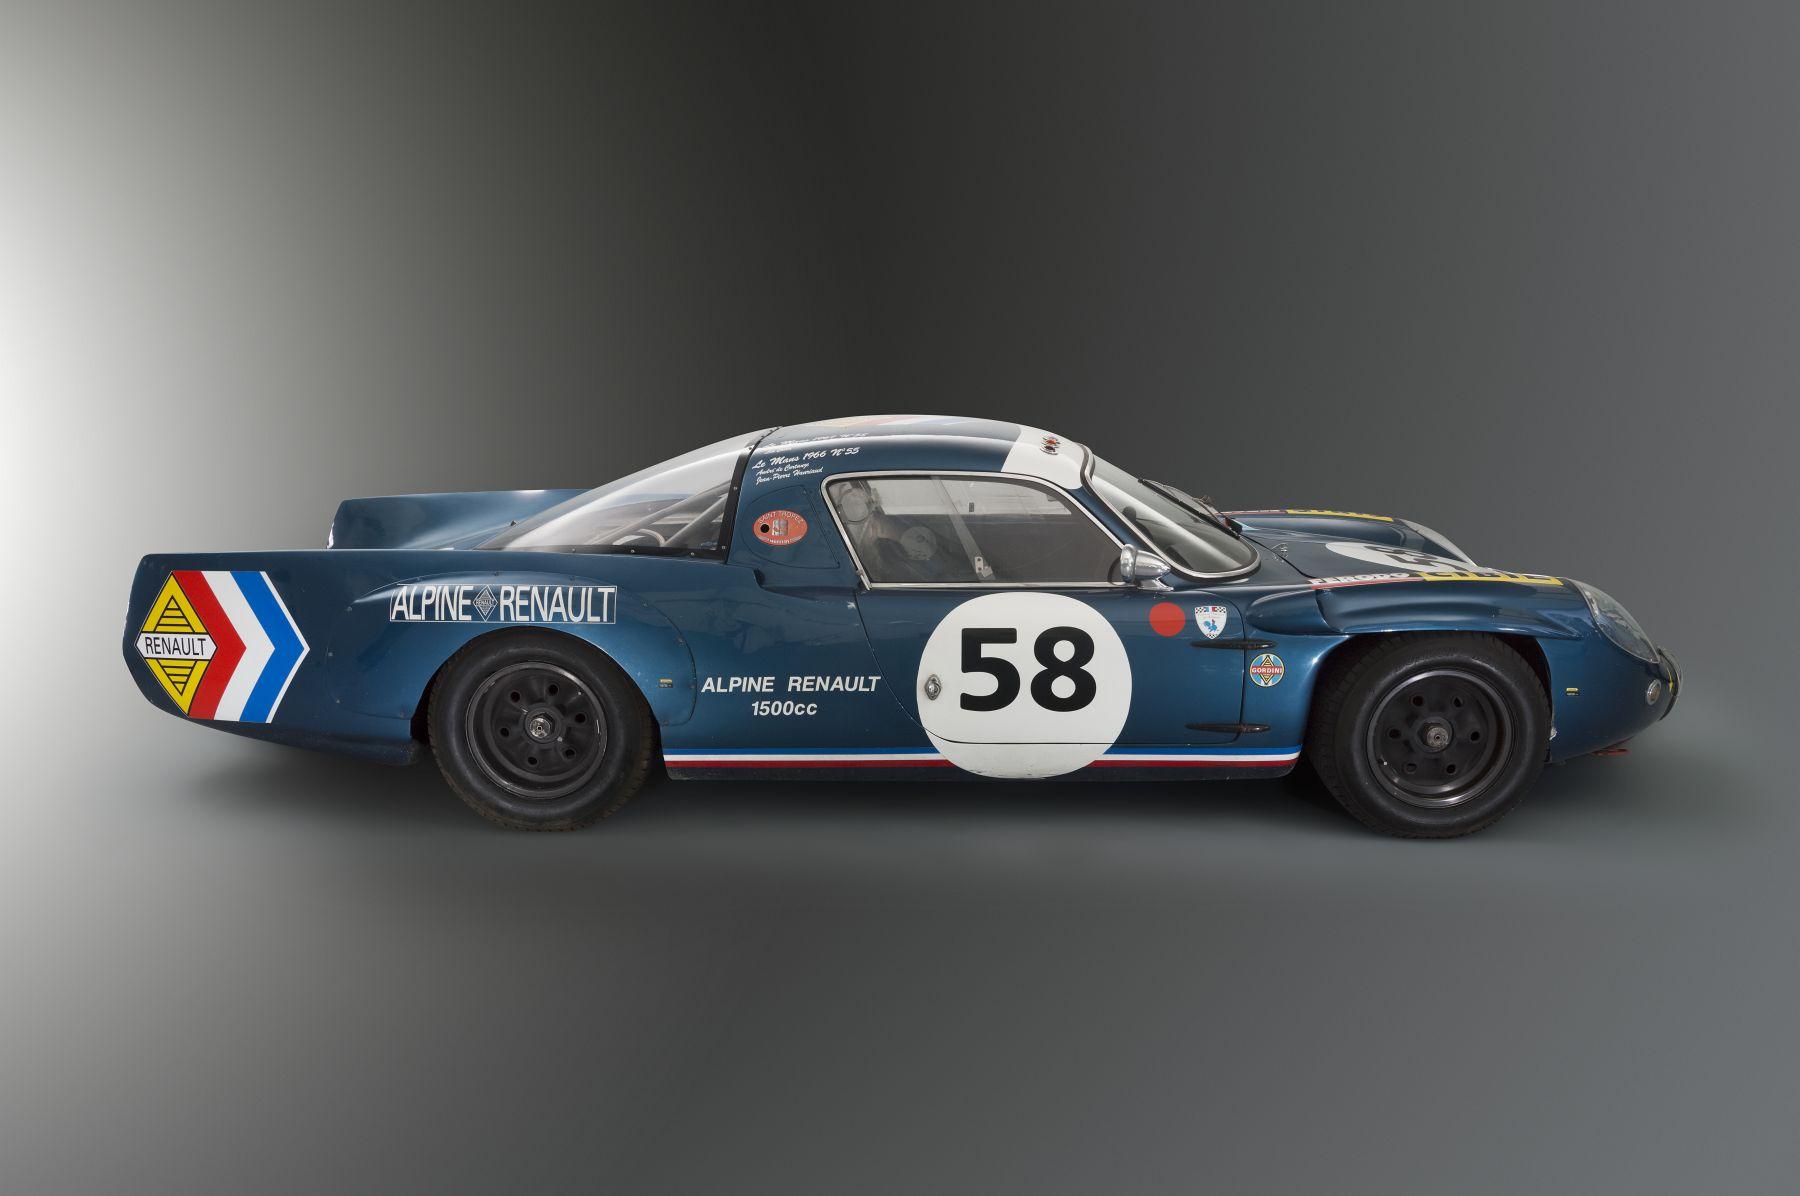 Alpine A210 Le Mans 1966 classicfriver com 20_9